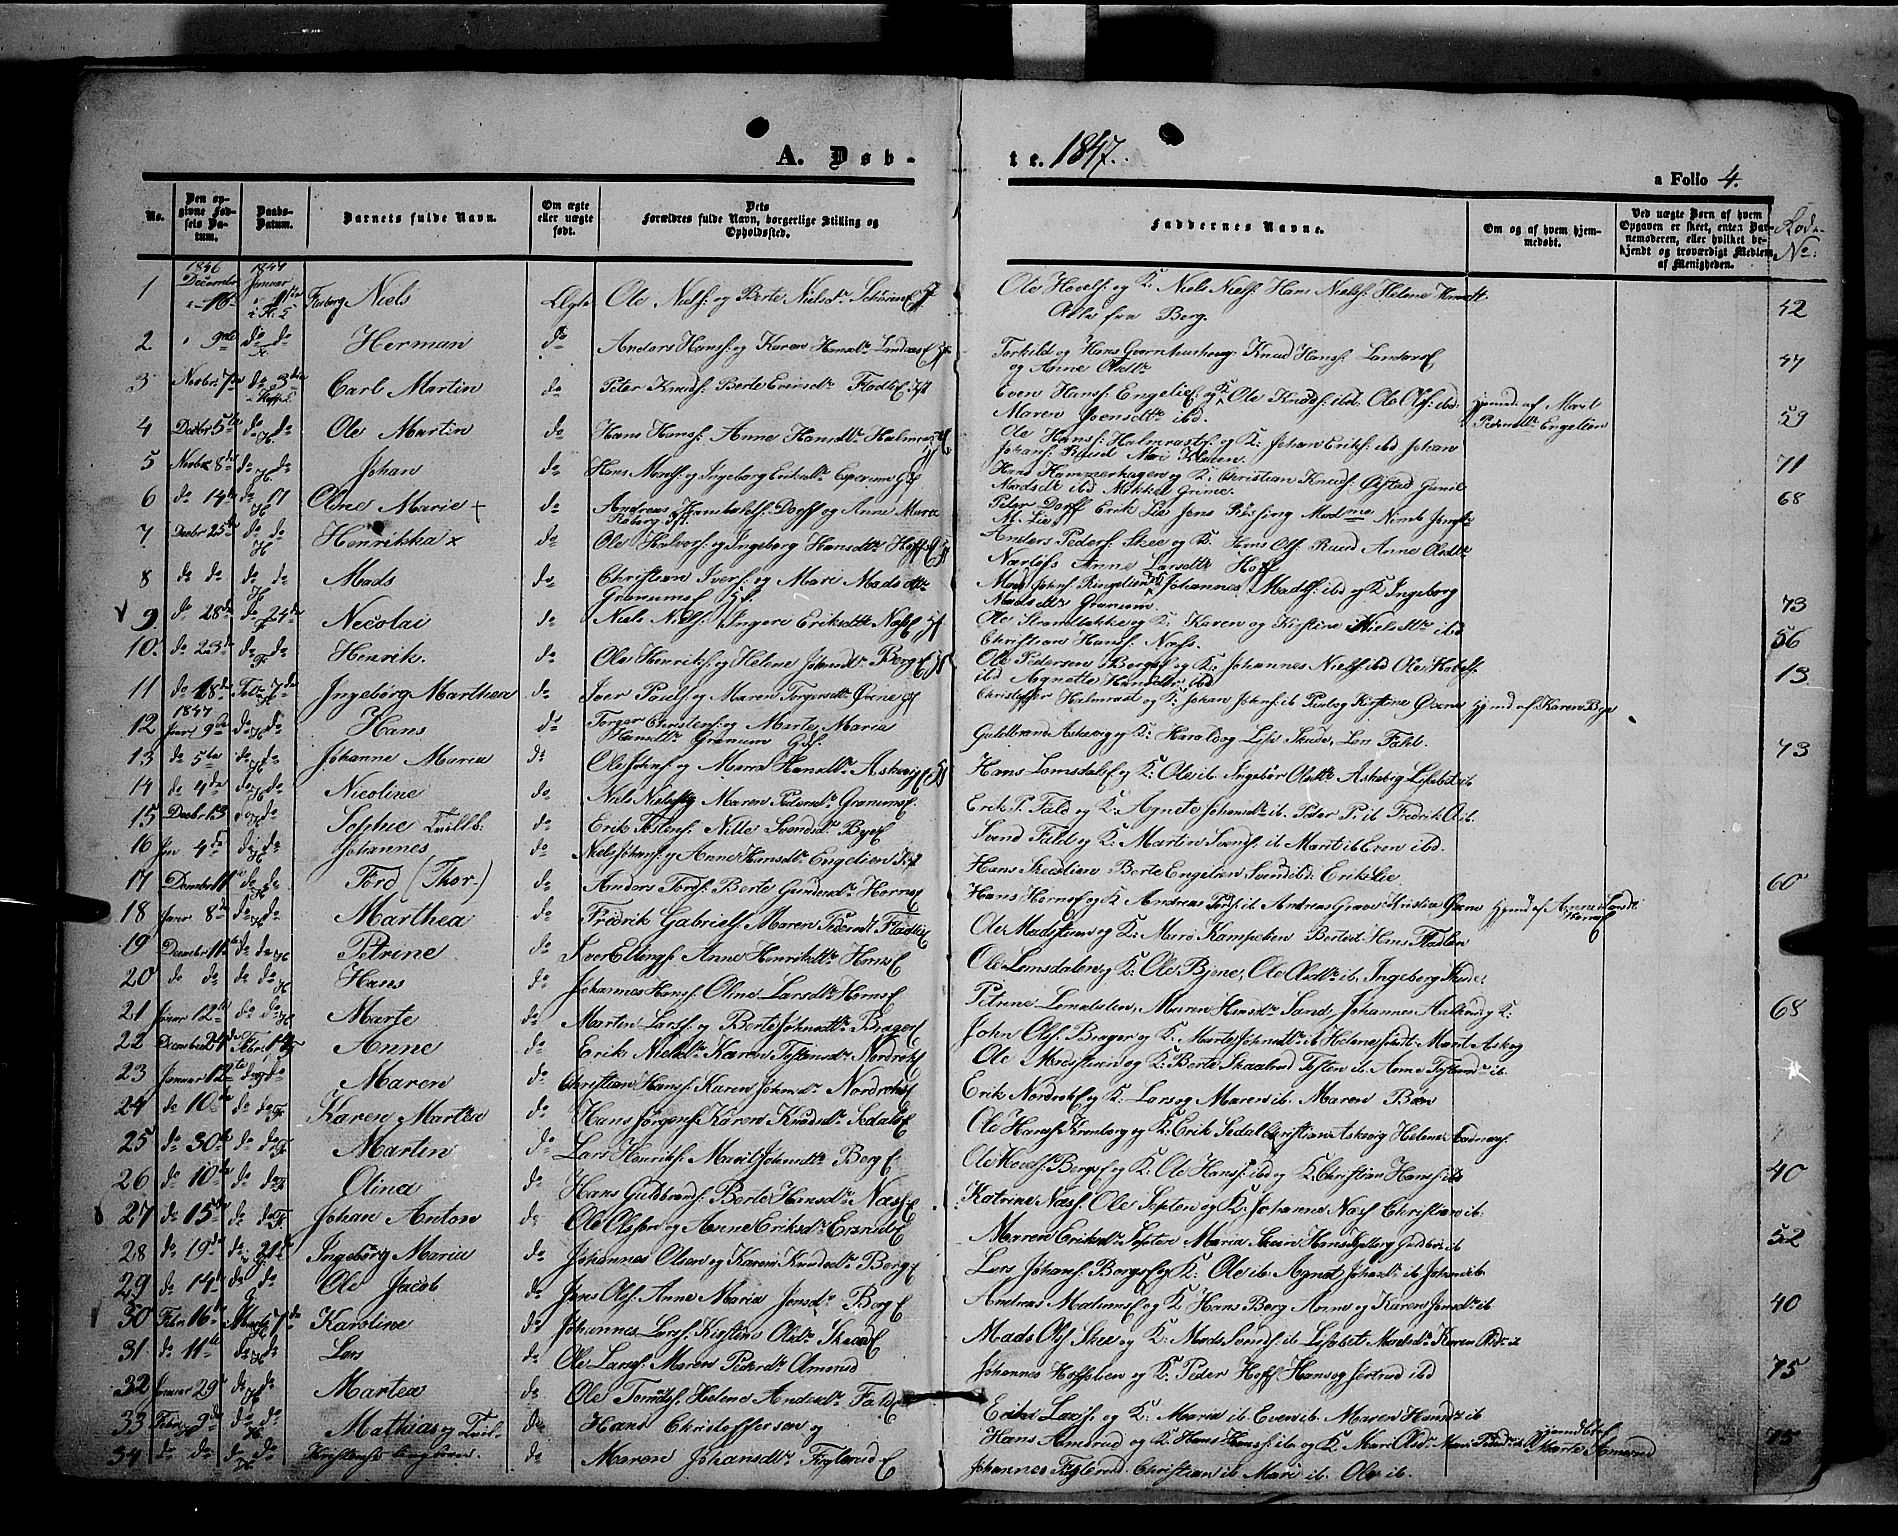 SAH, Land prestekontor, Ministerialbok nr. 9, 1847-1859, s. 4